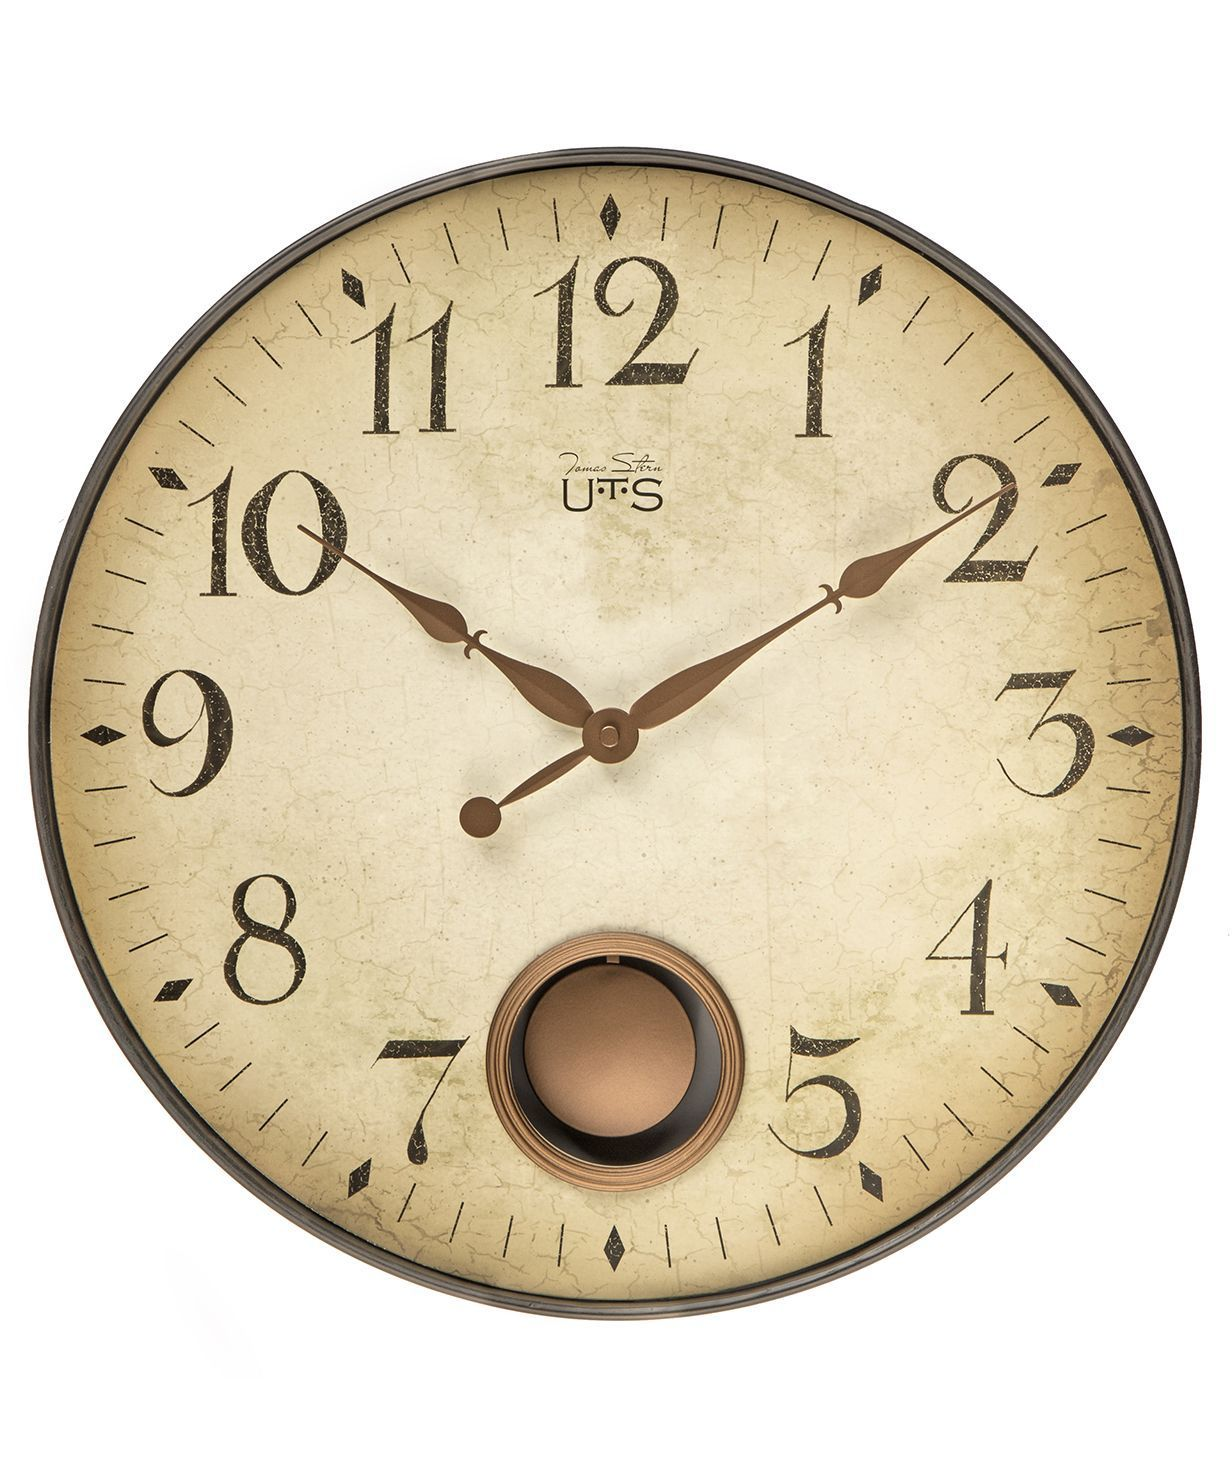 Часы настенные Часы настенные Tomas Stern 9005 chasy-nastennye-tomas-stern-9005-germaniya.jpg